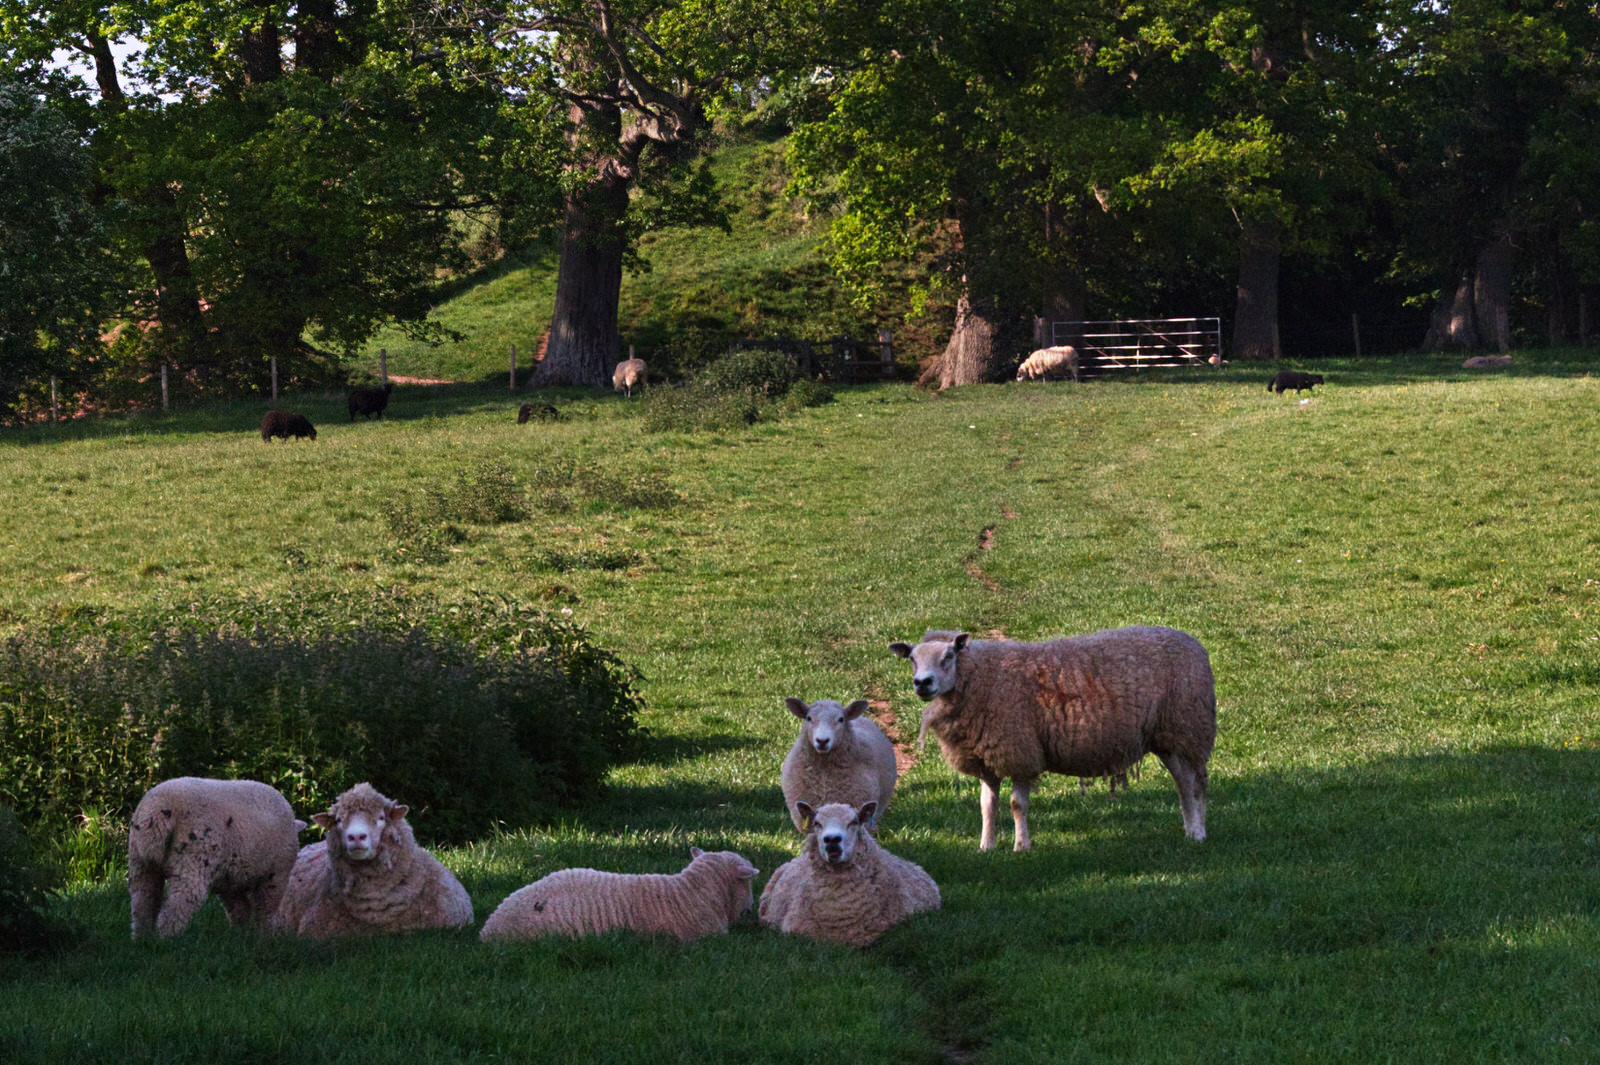 Sheep resting in shade of oak tree